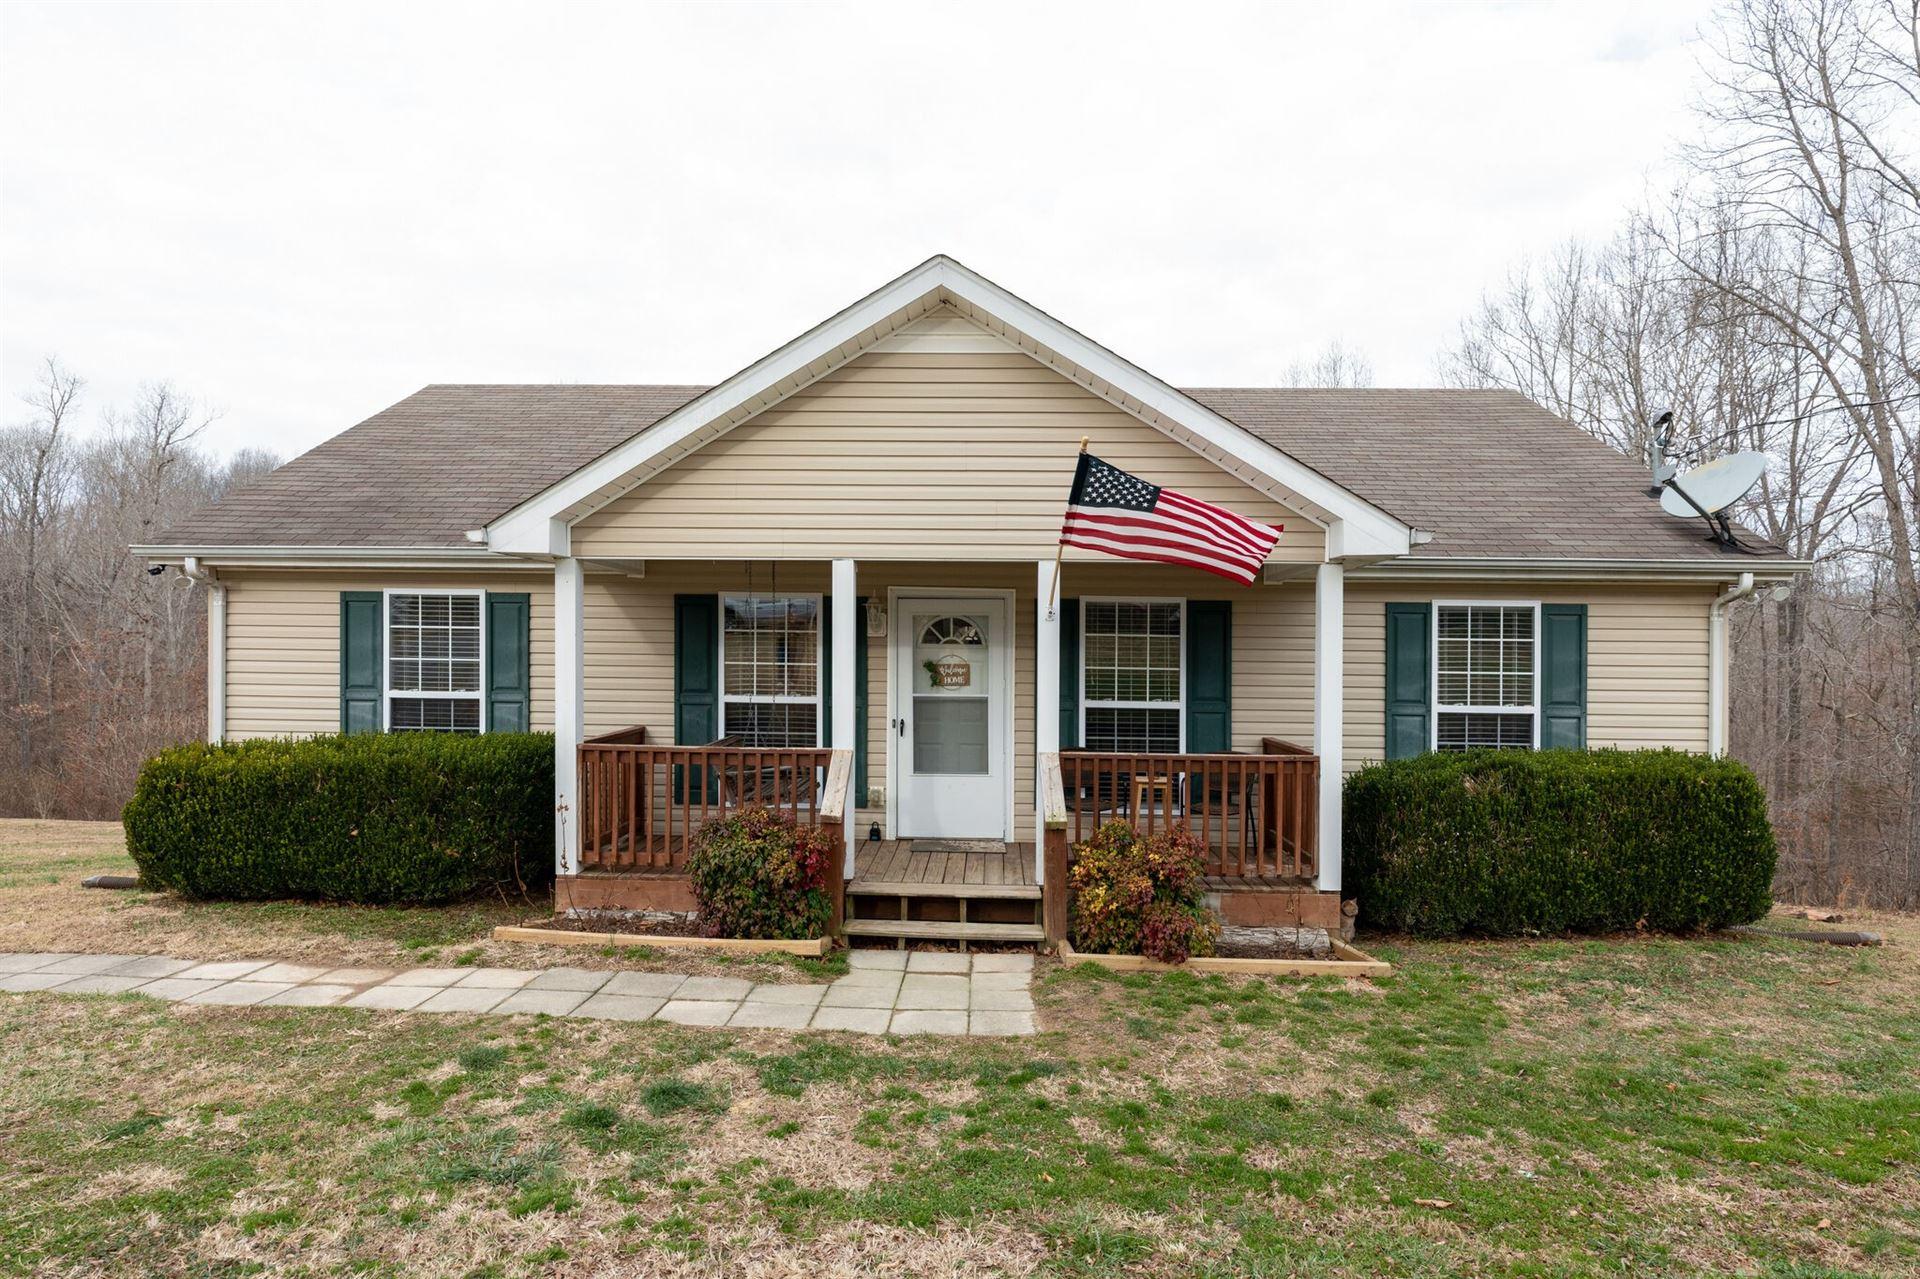 1009 Red Oak Rd, Charlotte, TN 37036 - MLS#: 2216860